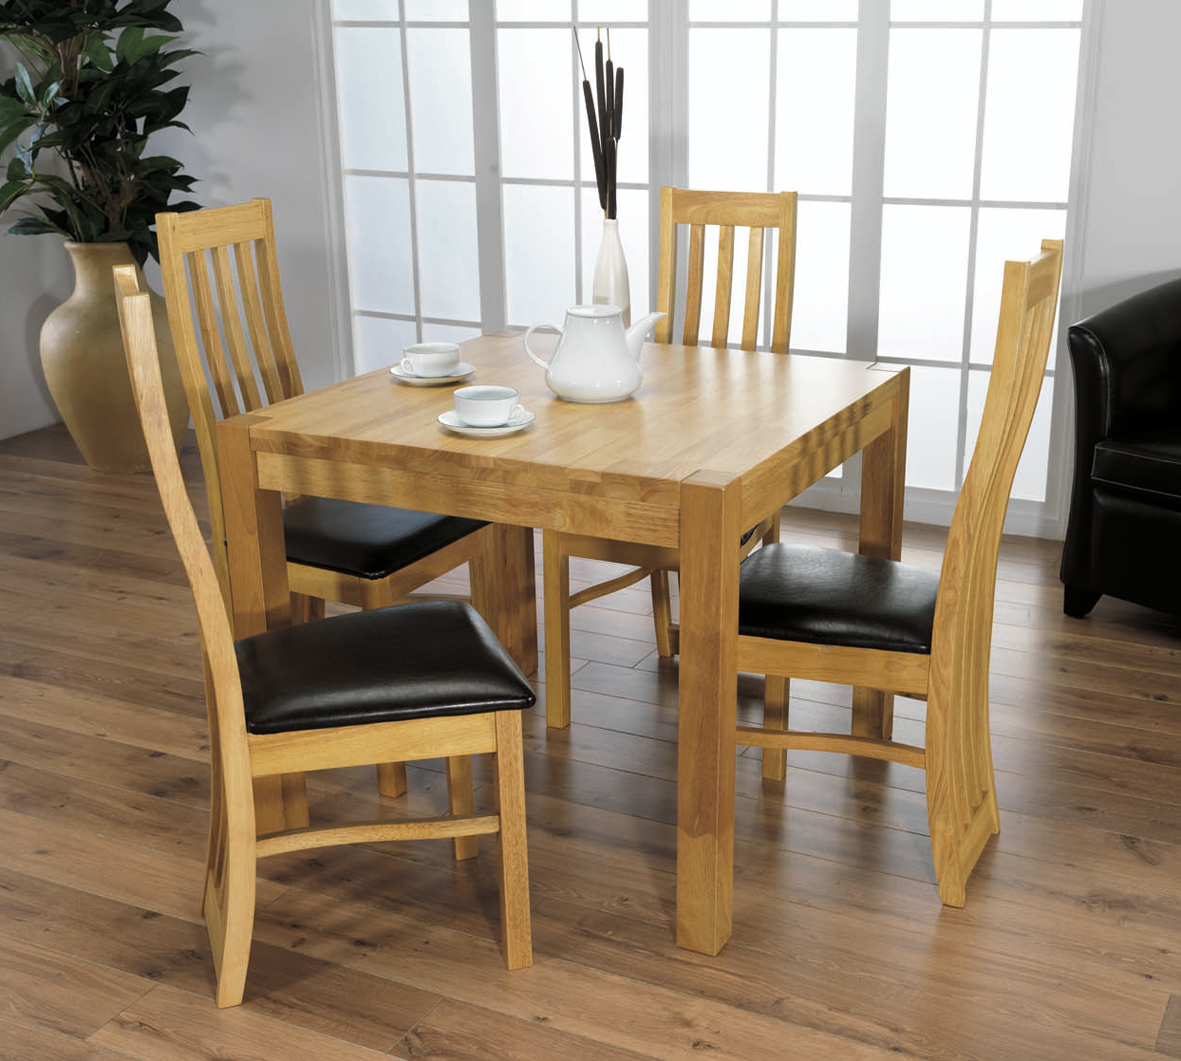 Black square kitchen table photo - 1